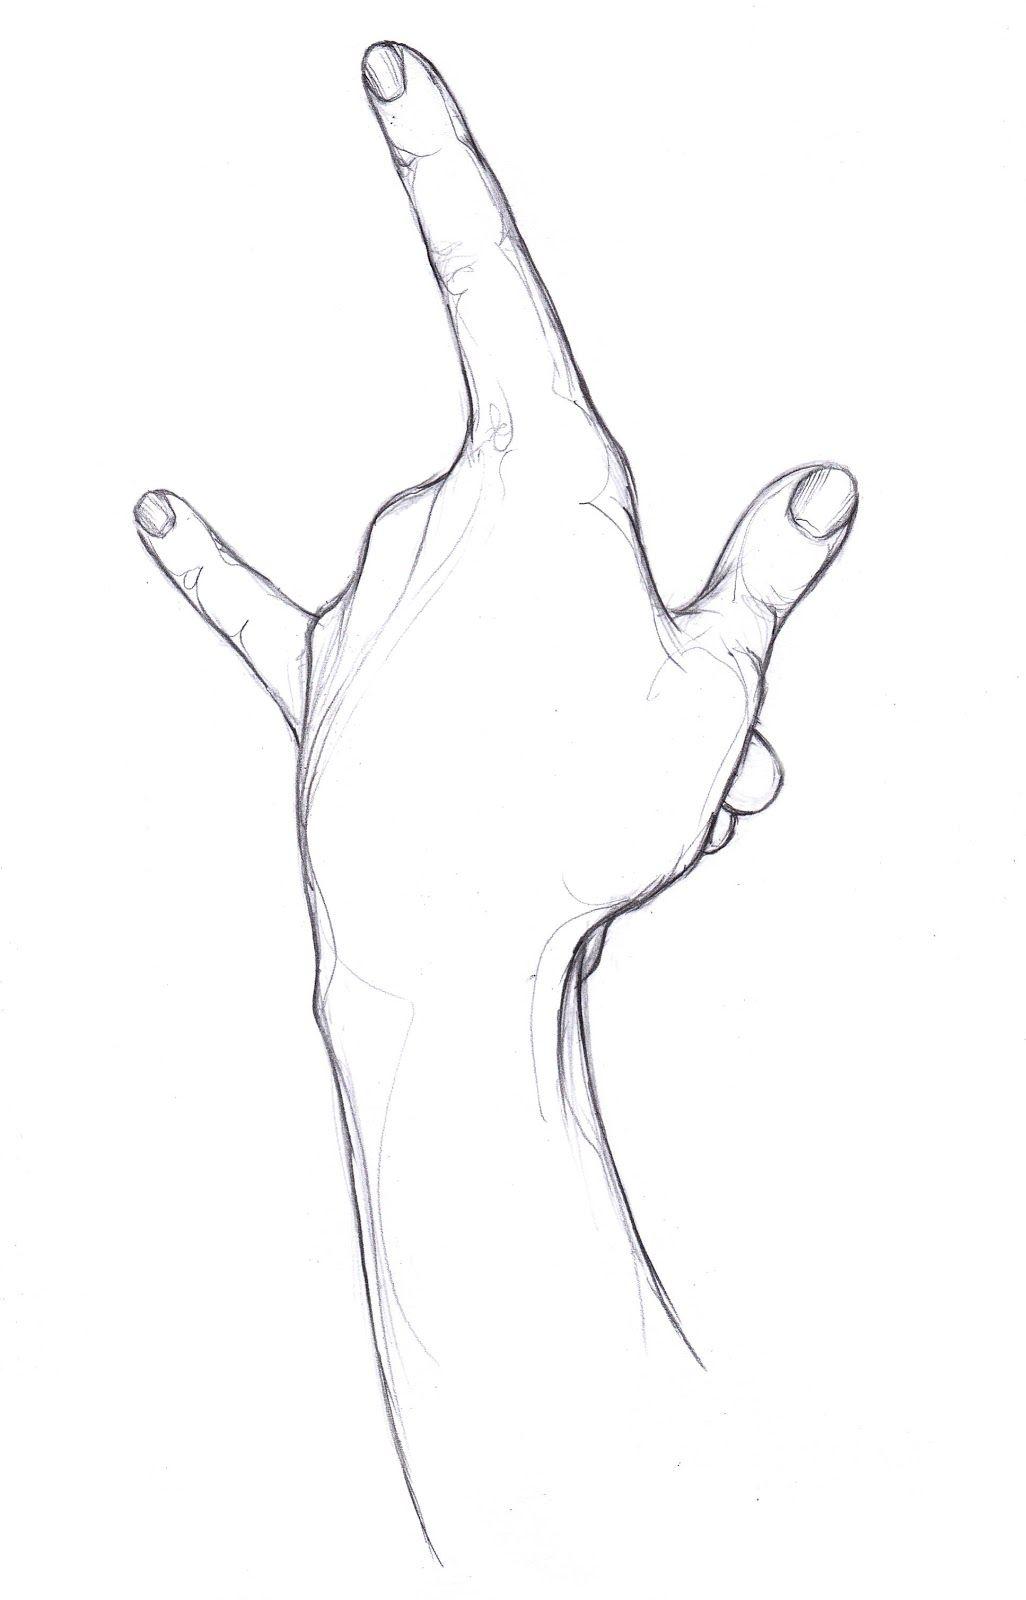 Simple Hand Drawings In Pencil